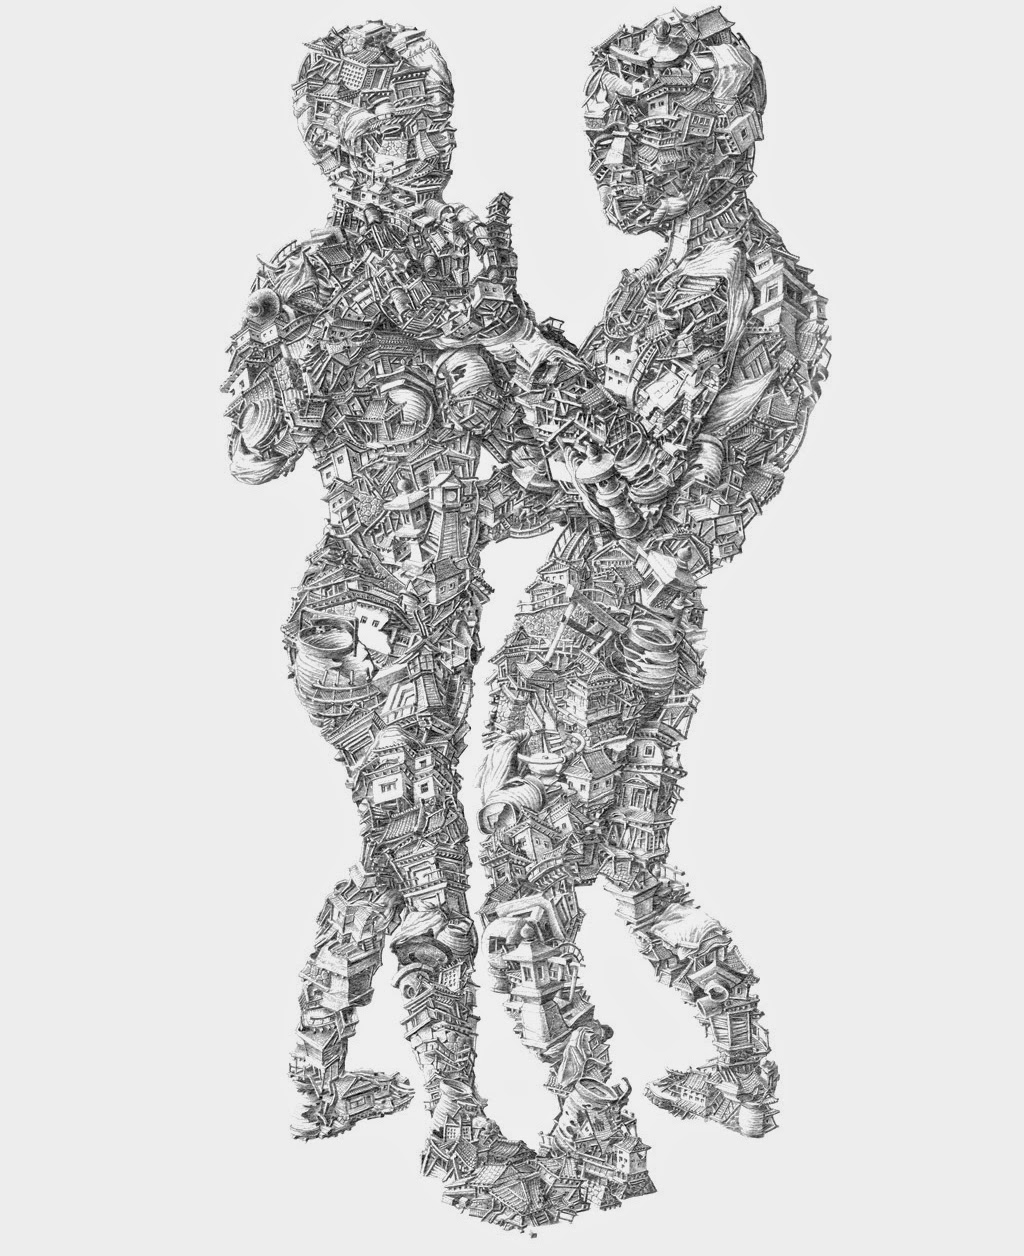 02-Dancers-Sean-Edward-Whelan-Architectural-Drawings-www-designstack-co